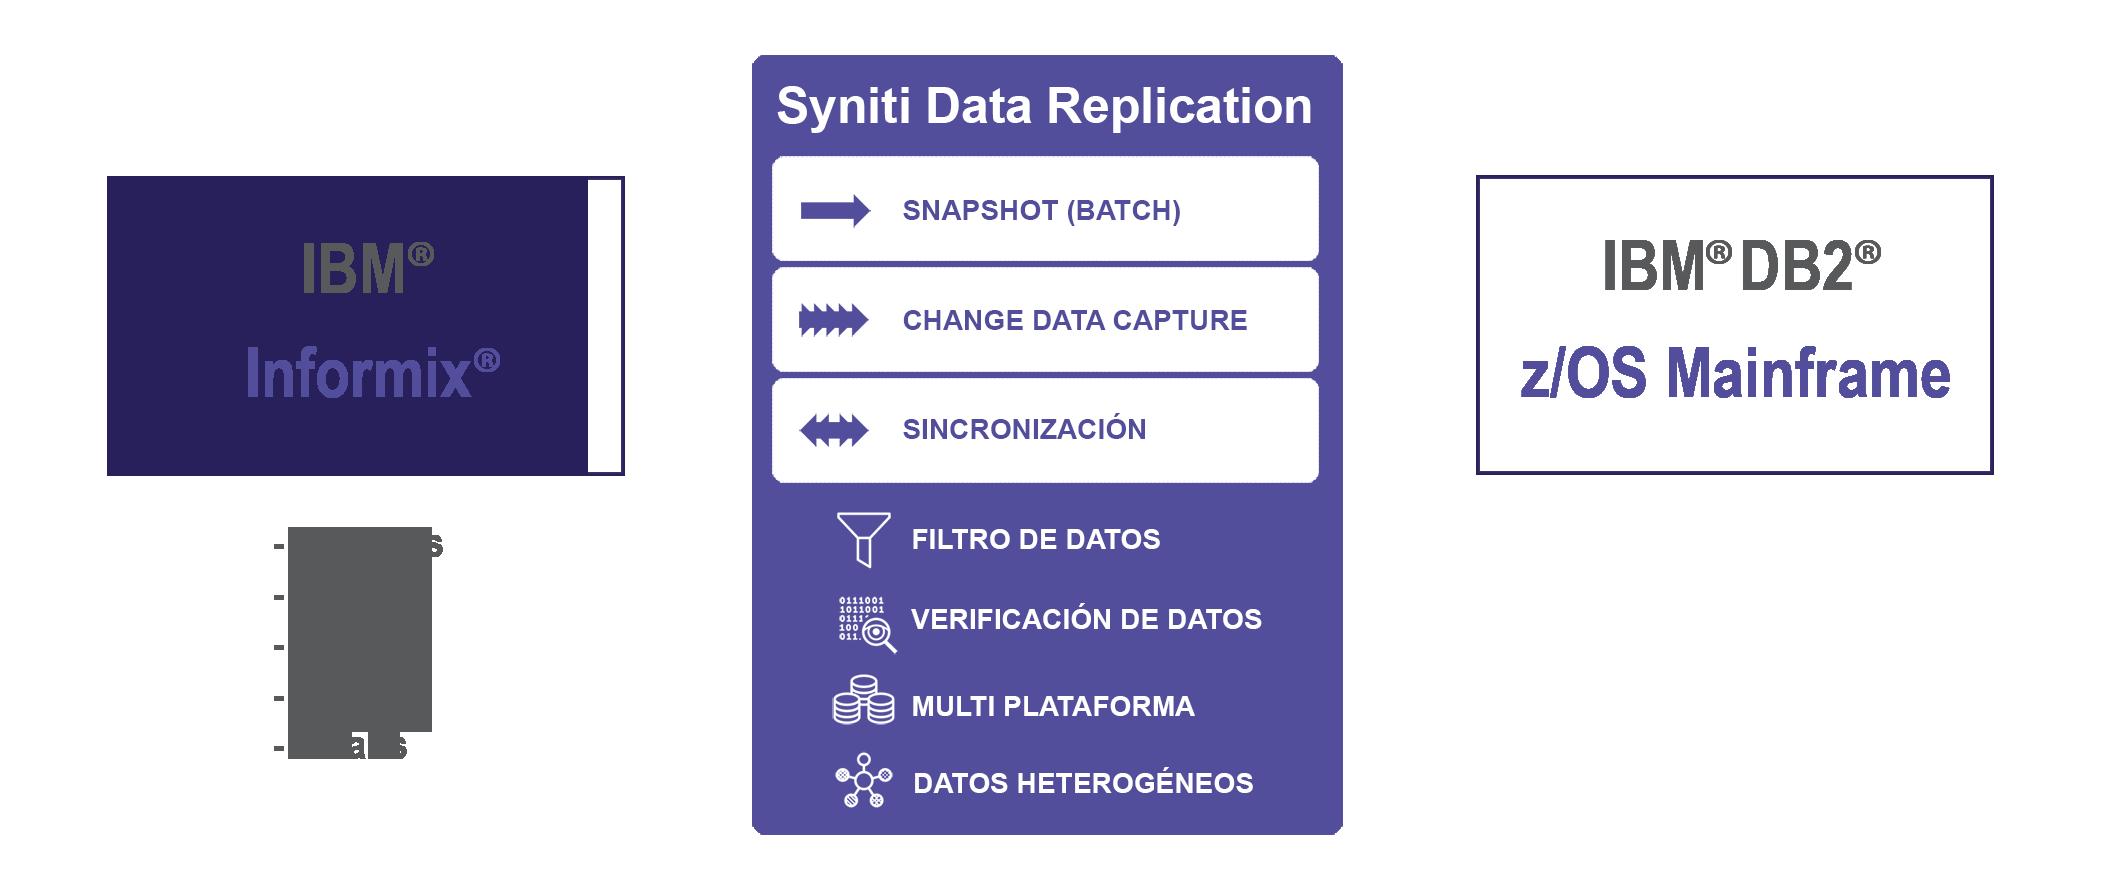 Replicación de datos Informix a DB2 z/OS en tiempo real